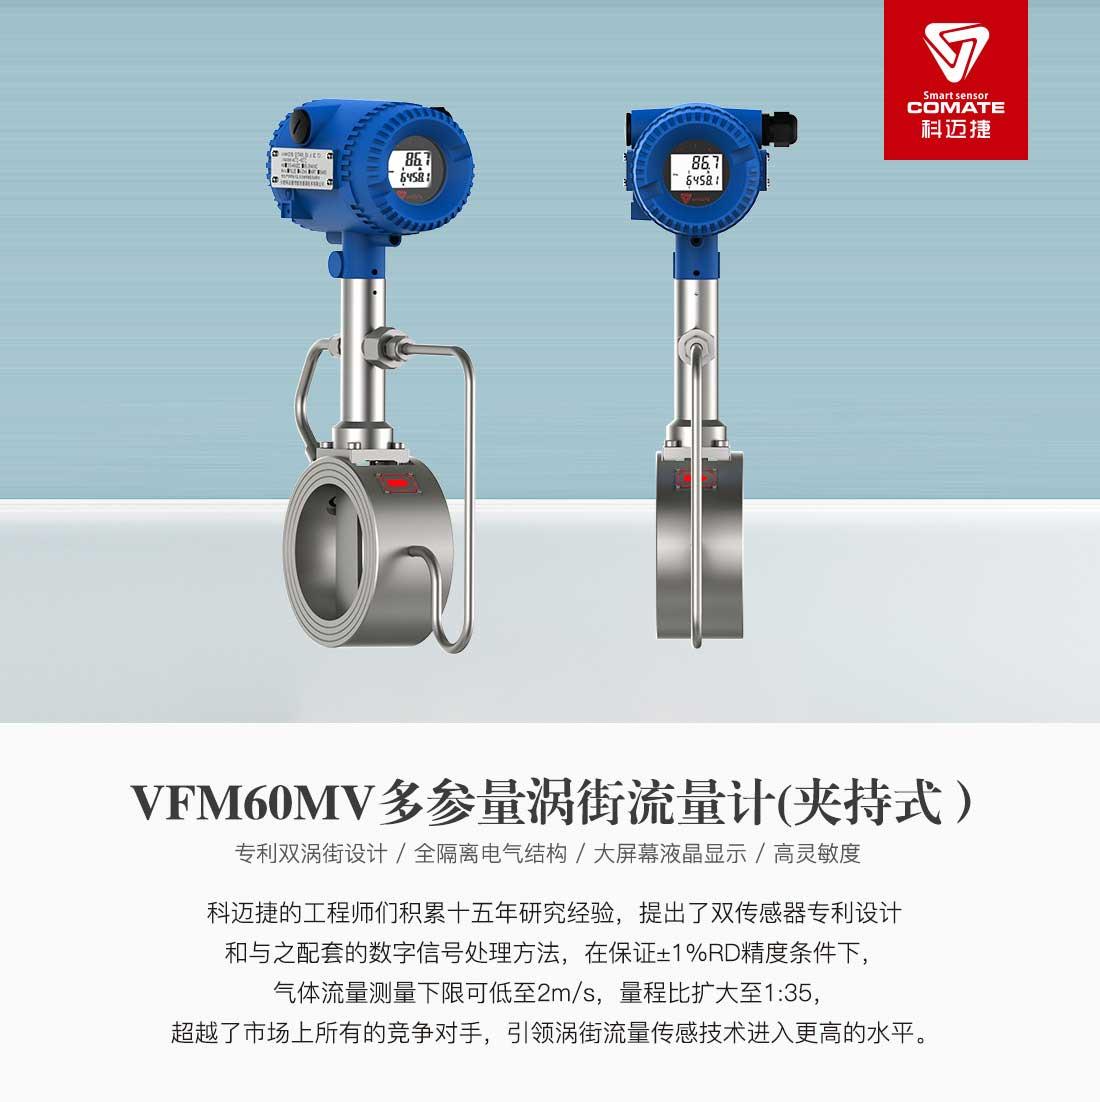 VFM60MV(夹持式)_01.jpg